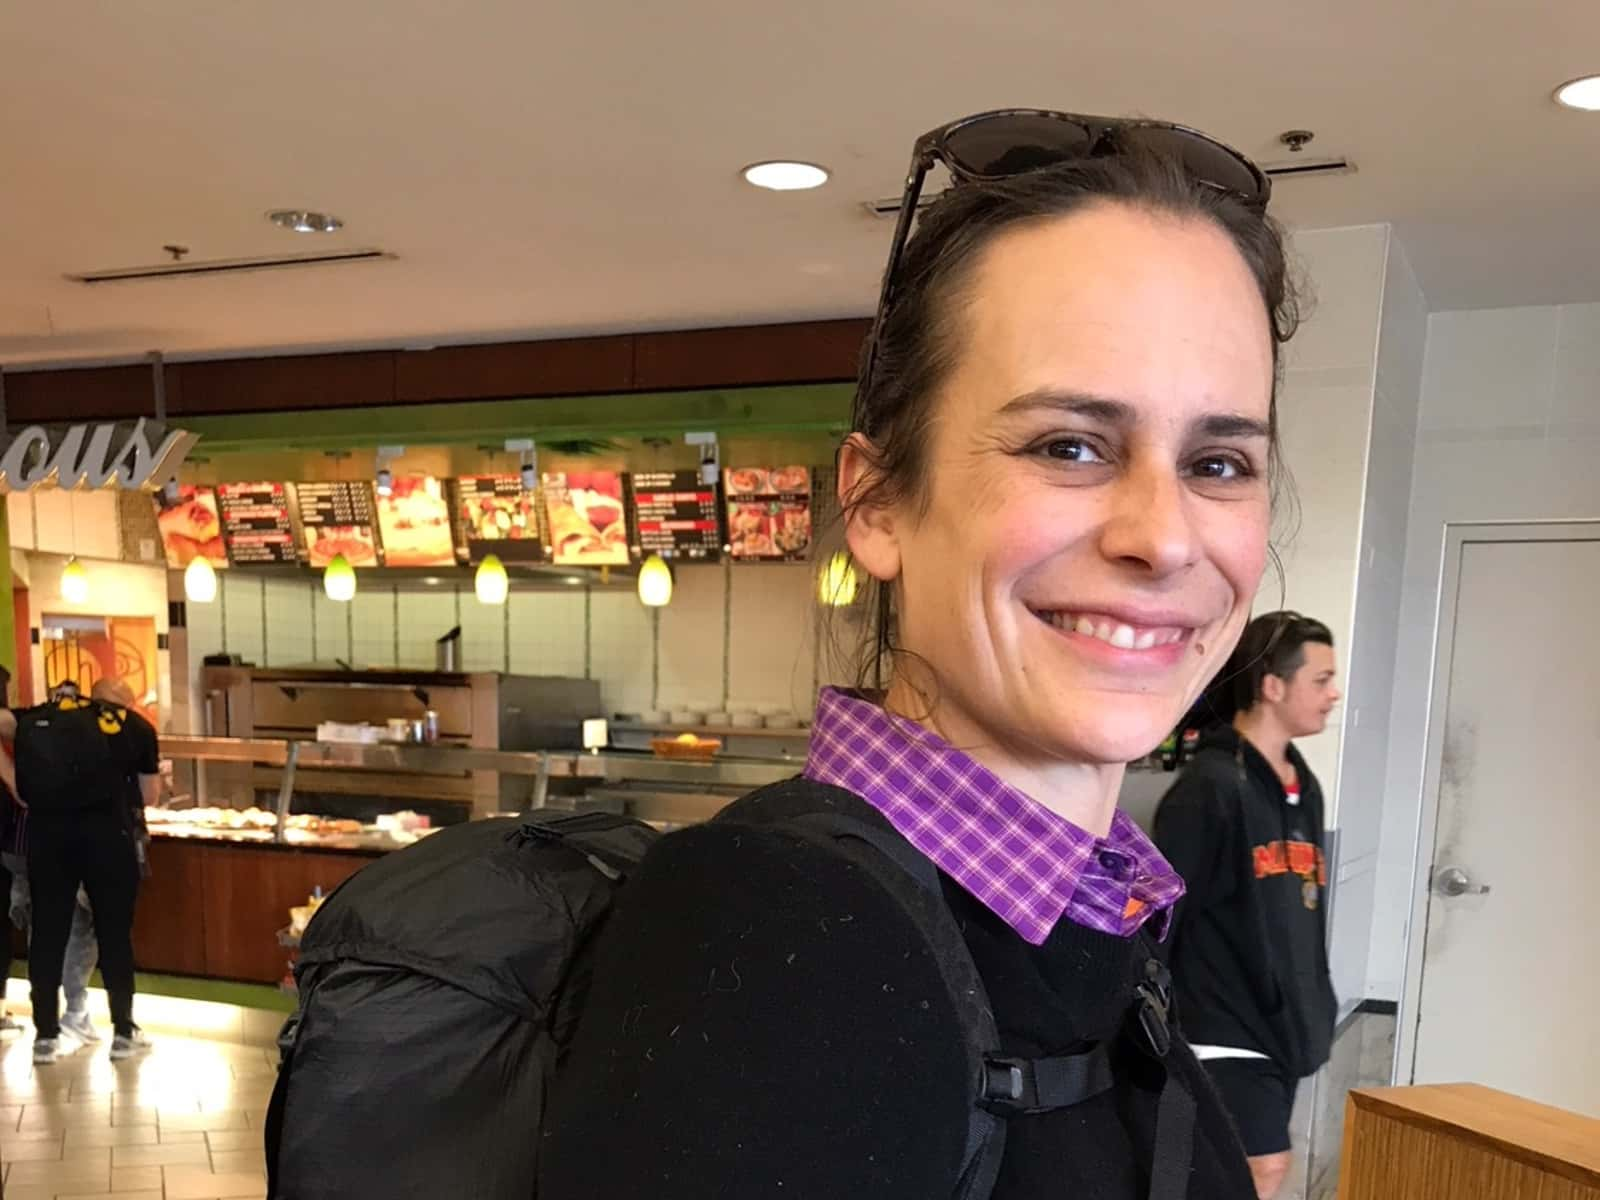 Emilie from Minneapolis, Minnesota, United States